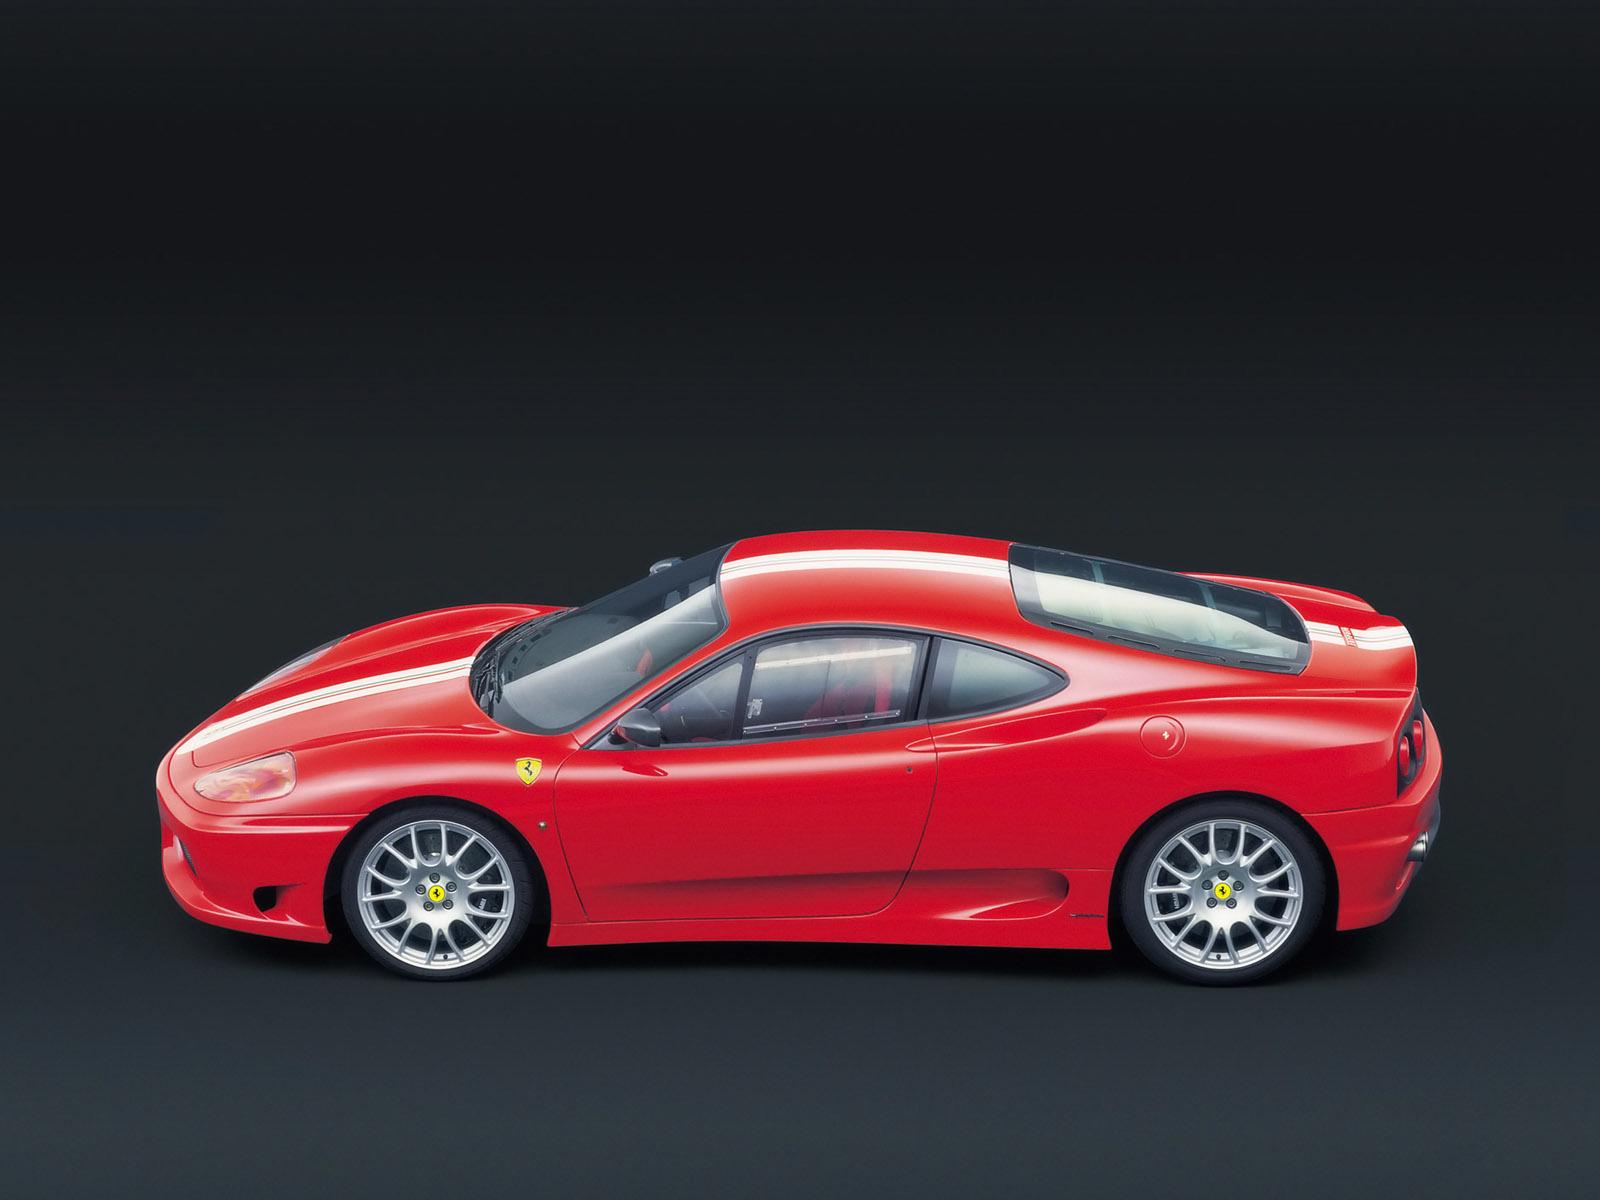 ferrari 1%2B%25281%2529 10 λόγοι που η Ferrari 360 Challenge Stradale ανήκει στο γκαράζ των ονείρων μας Ferrari, Ferrari 360 Challenge Stradale, Ferrari 360 Modena, Ferrari Challenge Stradale, videos